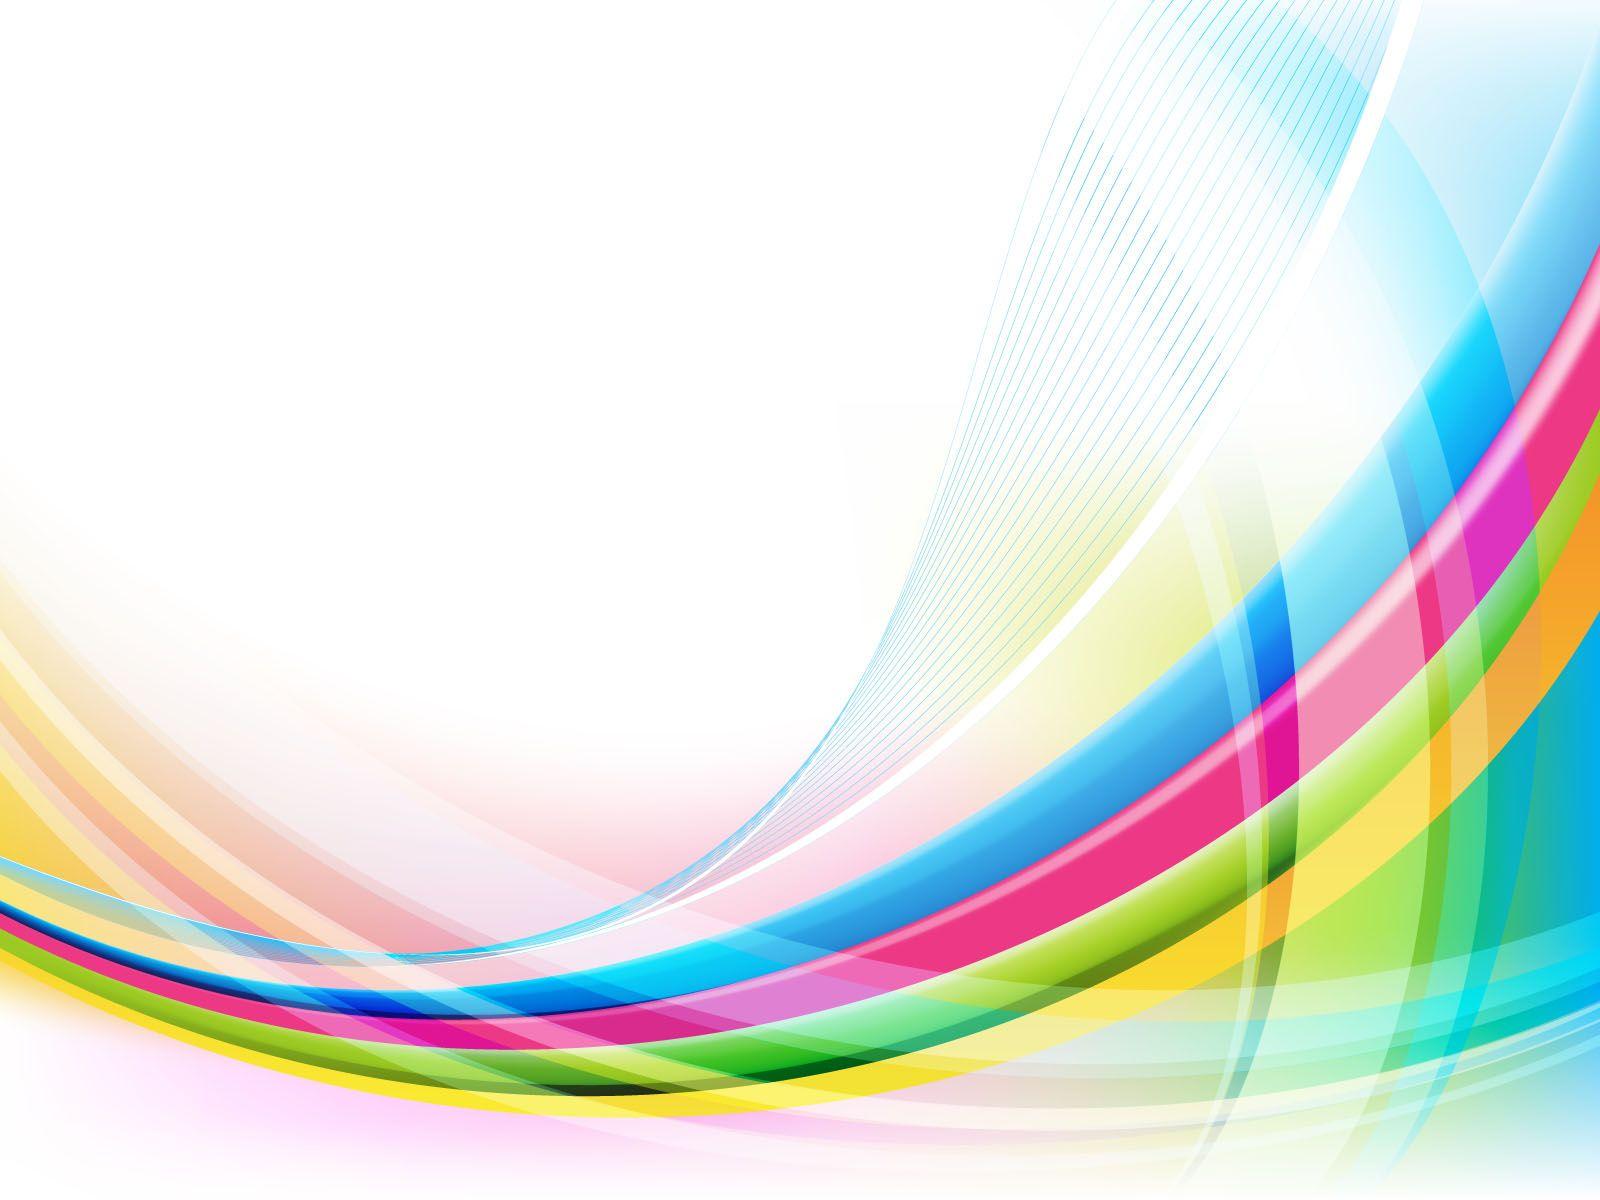 Google Image Result For Http Static Hothdwallpaper Net 517e27fc7278577449 Jpg Latar Belakang Abstrak Gambar Tulisan Tangan Ilustrasi Vektor